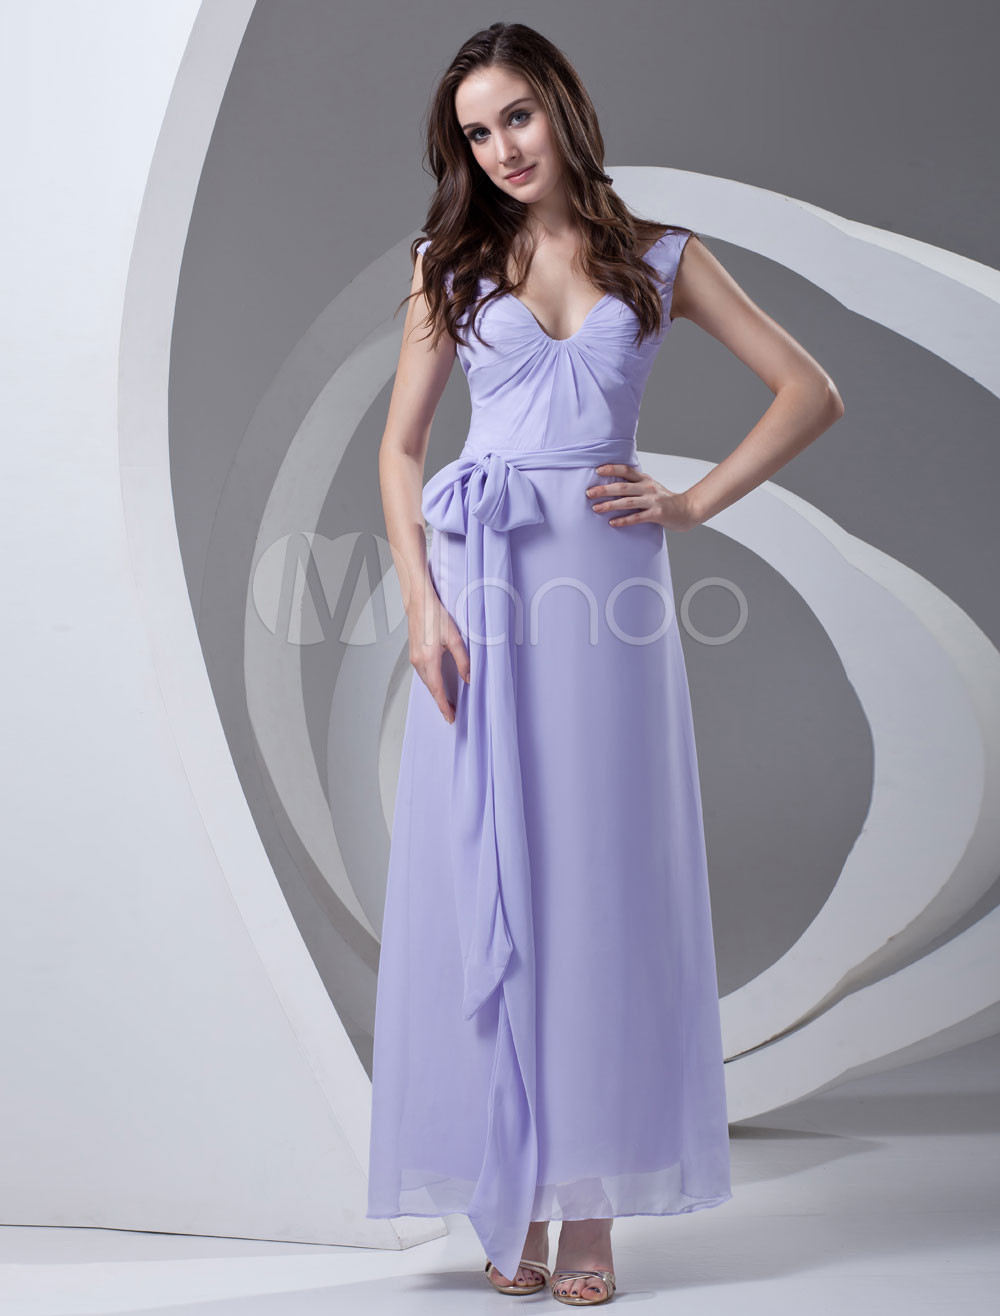 Sheath Lavender Chiffon Sash Off-The-Shoulder Ankle-Length Bridesmaid Dress For Wedding